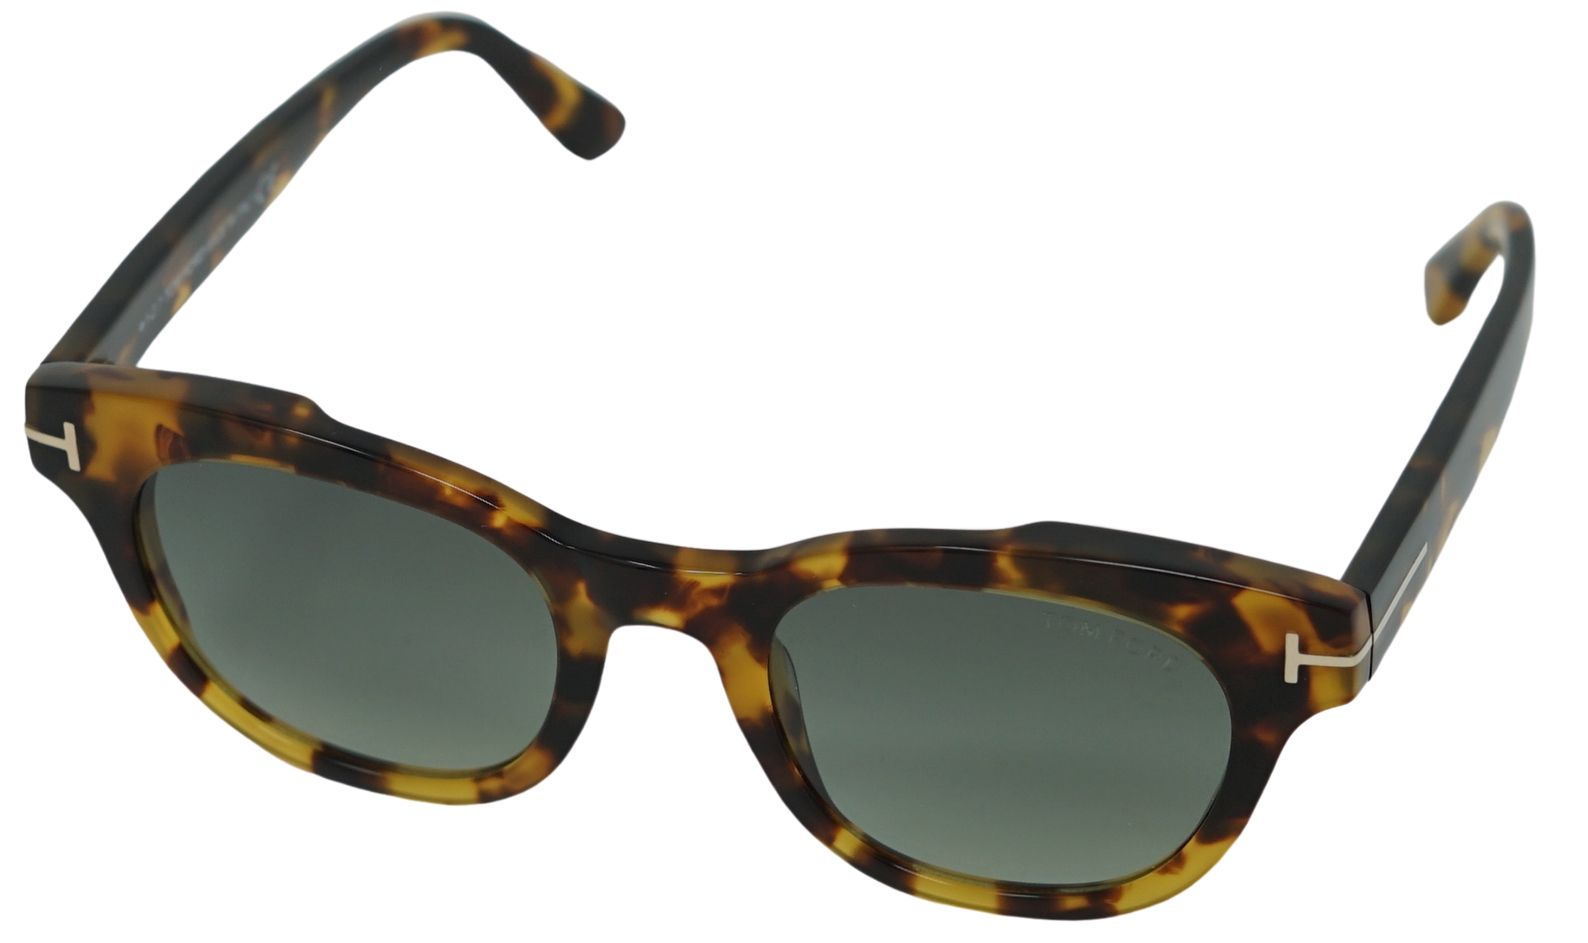 Tom Ford Elizabeth Sunglasses FT0616 55P